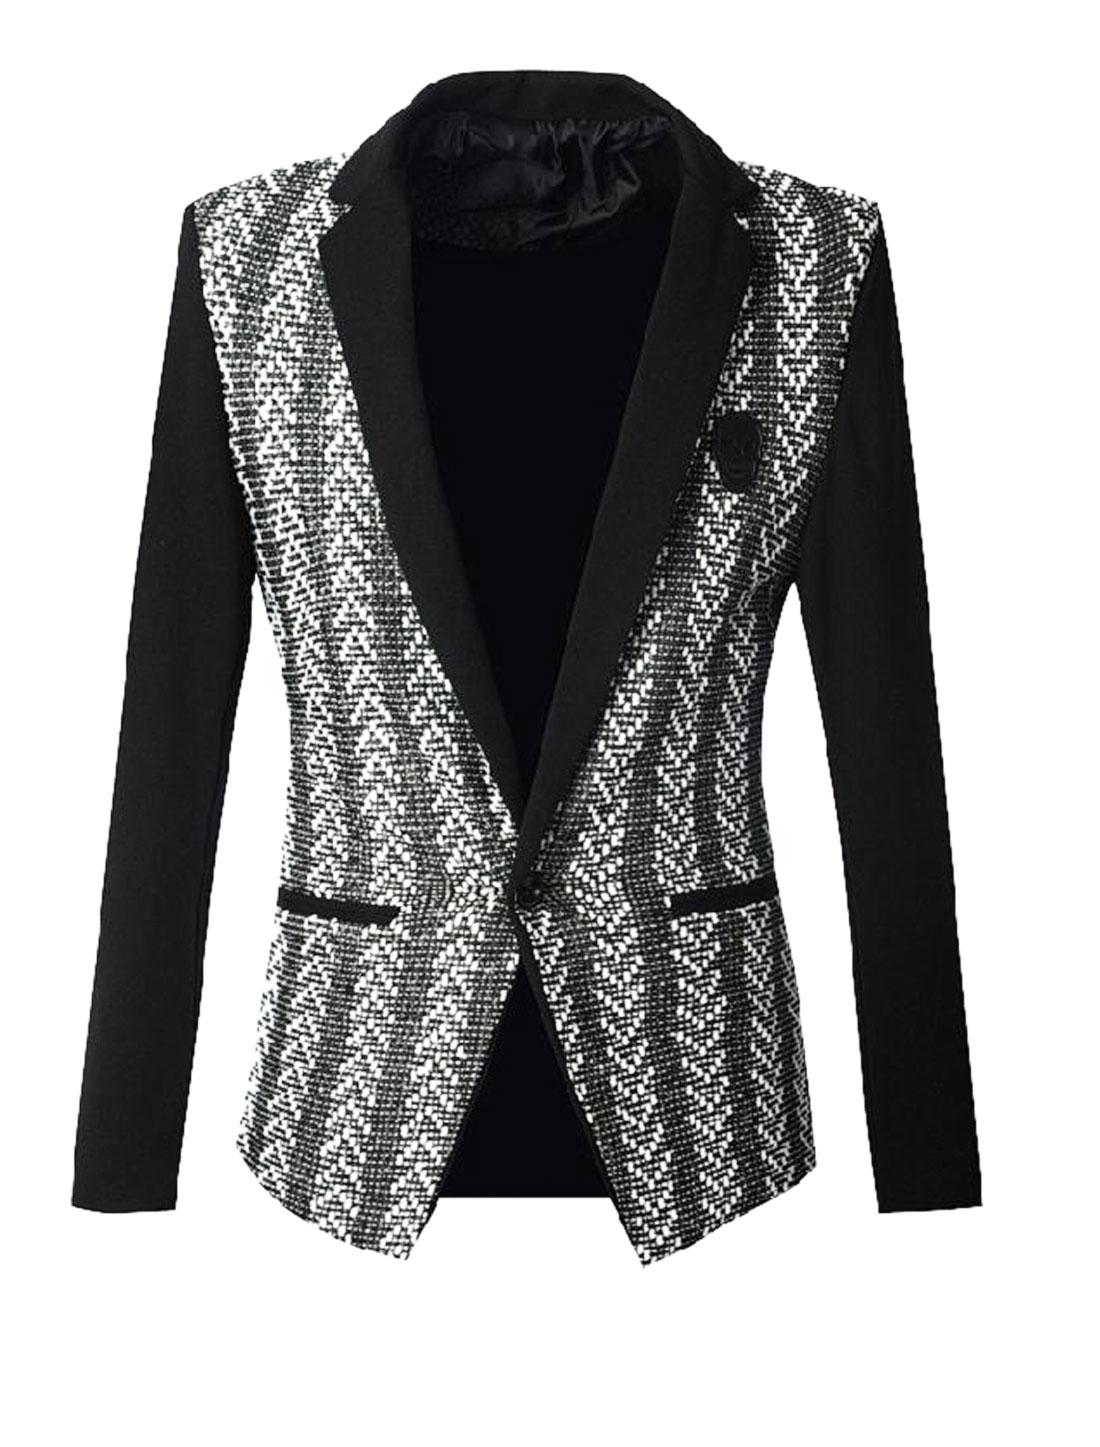 Men Intertexture Design Notched Lapel Premium Blazer Jacket Black S